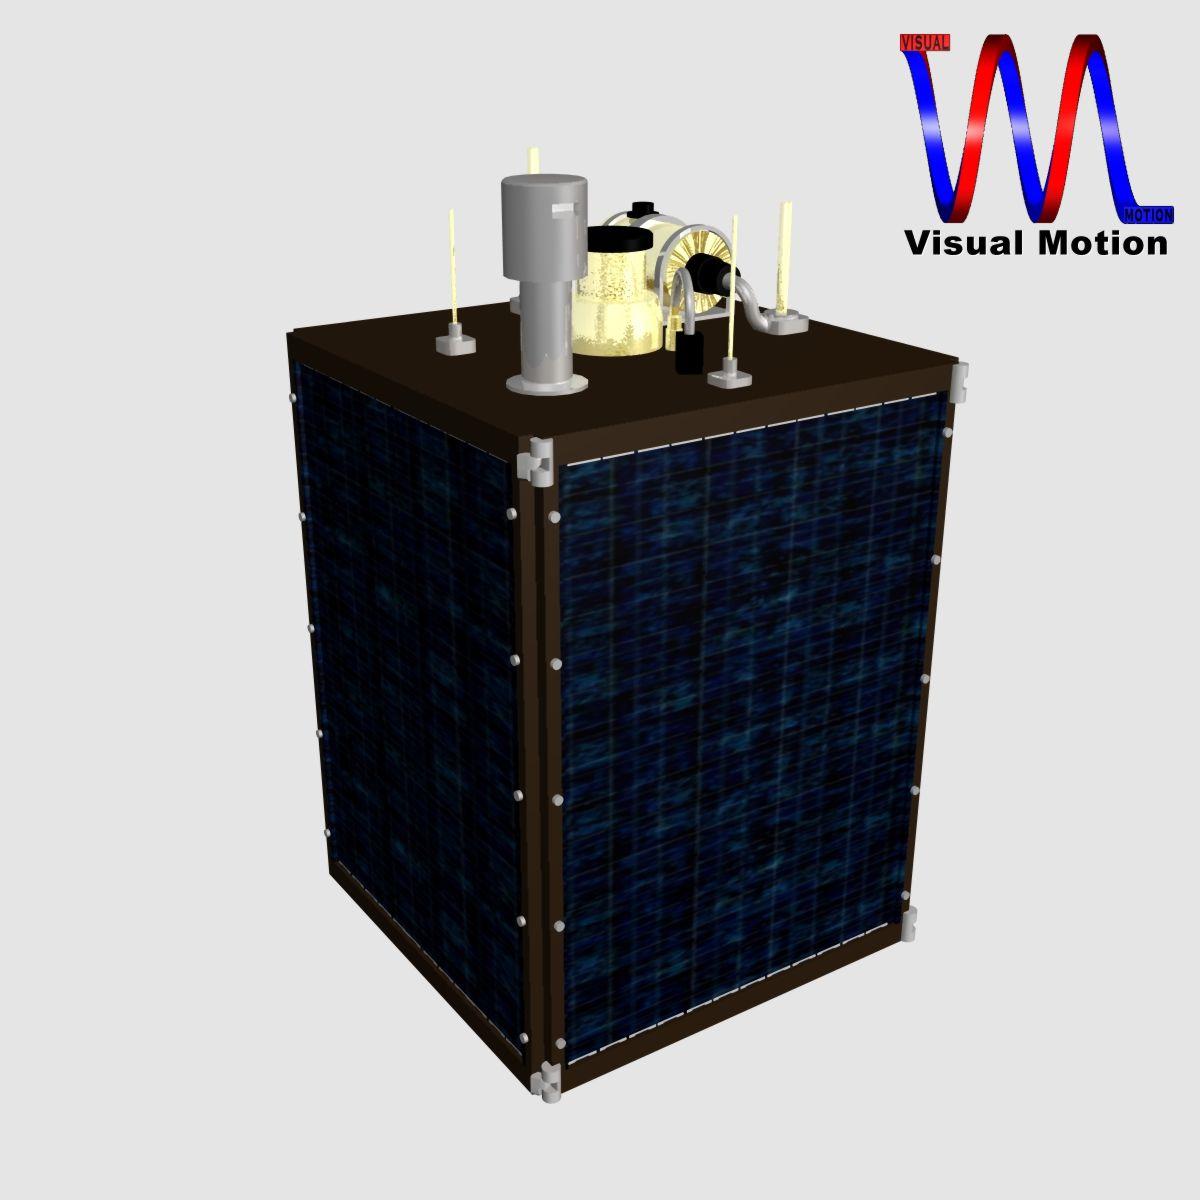 dprk kwangmyongsong-3 satellite 3d model 3ds dxf cob x obj 134457